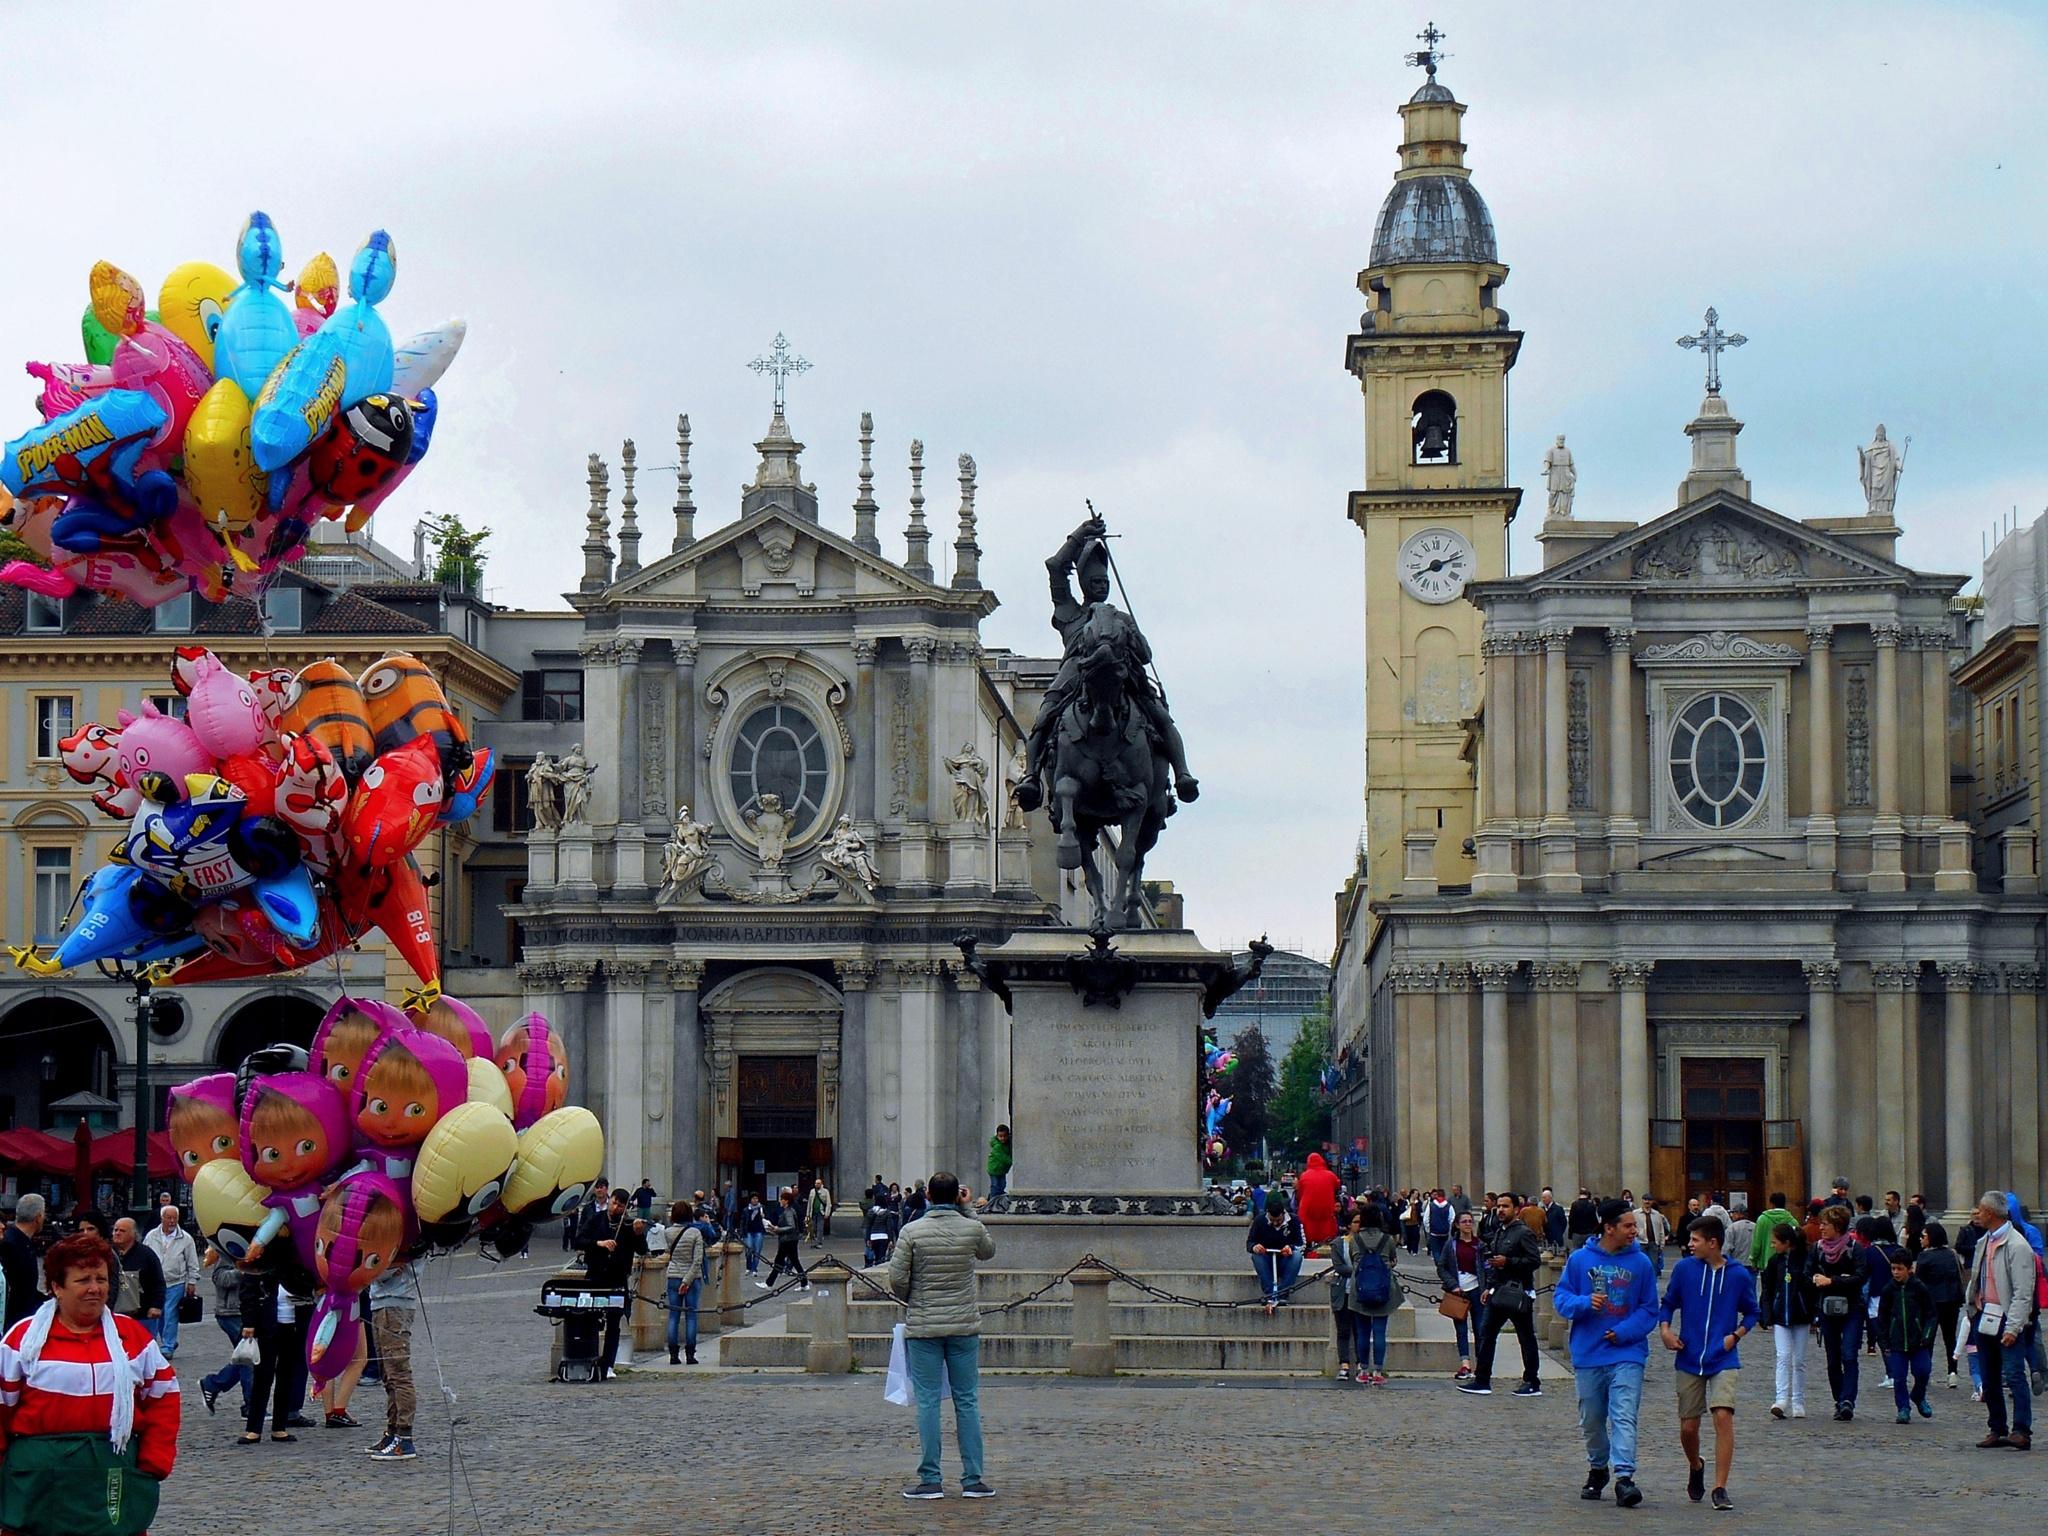 Piazza San Carlo by Piercarlo Bedino